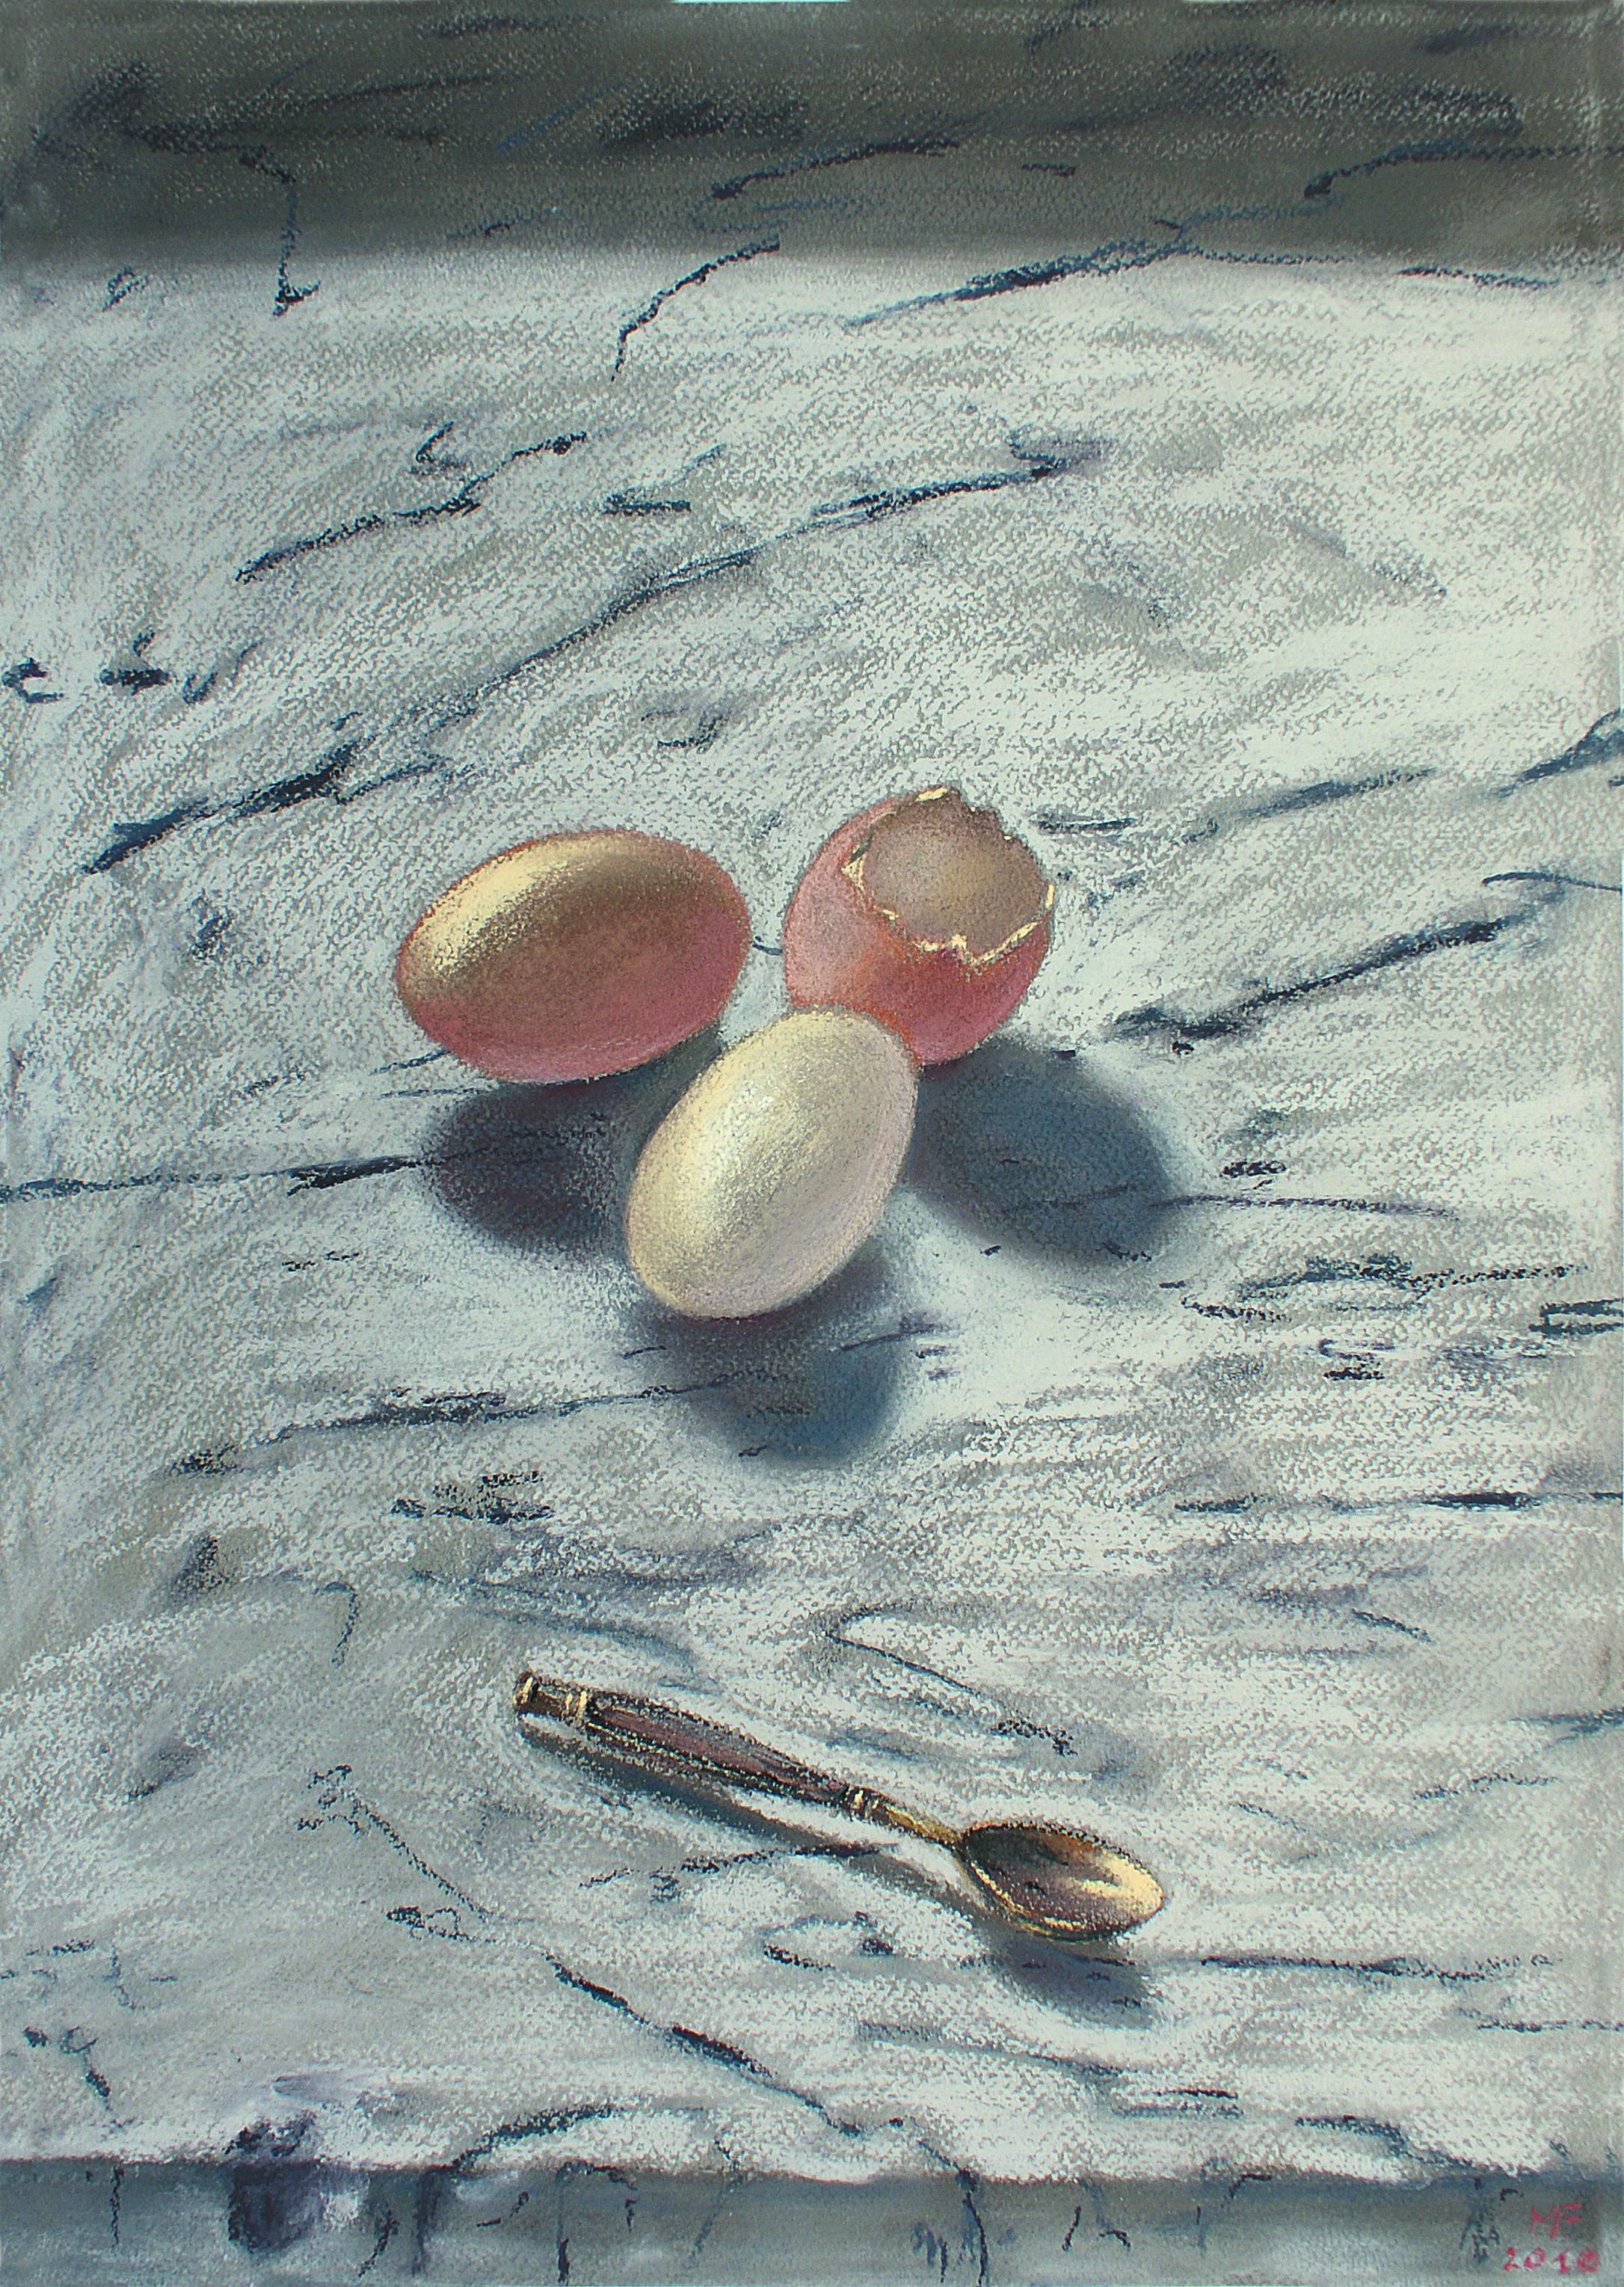 B 8) Uova e cucchiaino, 2010, pastello su carta Ingres, 50x35